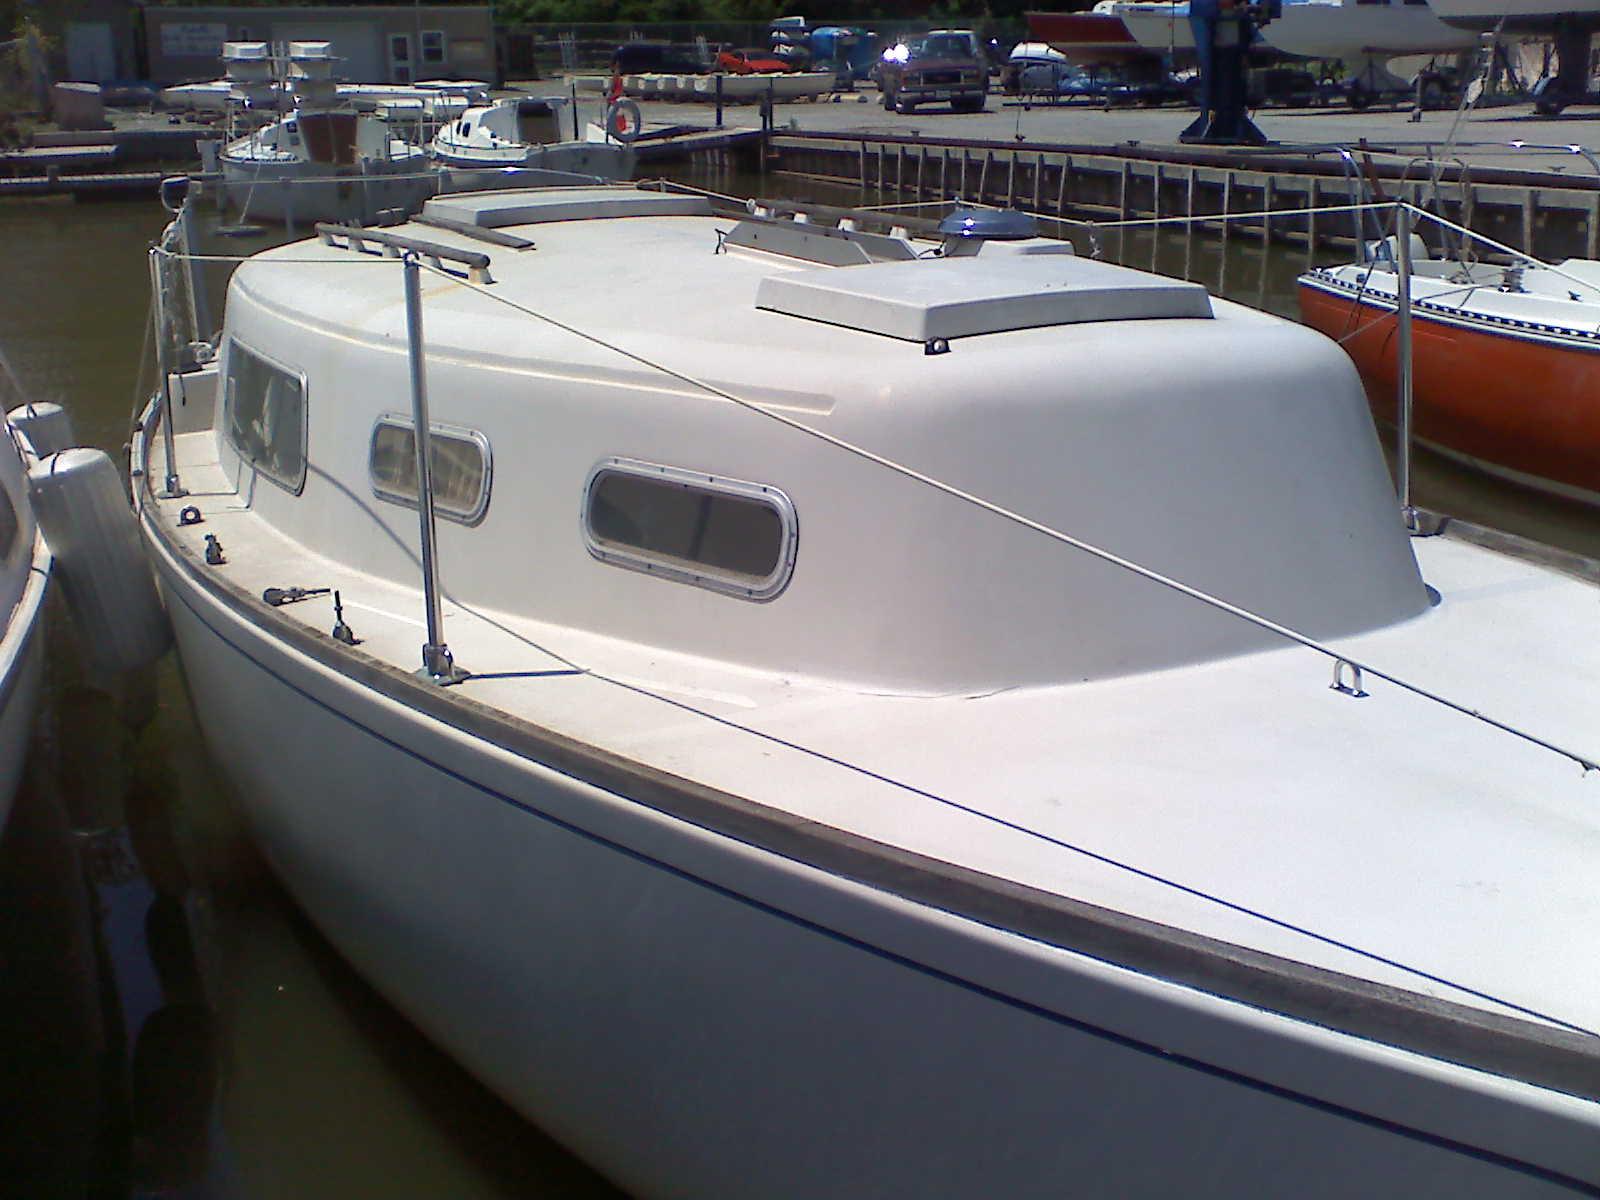 Highland Fling  My Grampian 26 Sailboat  Windows Project